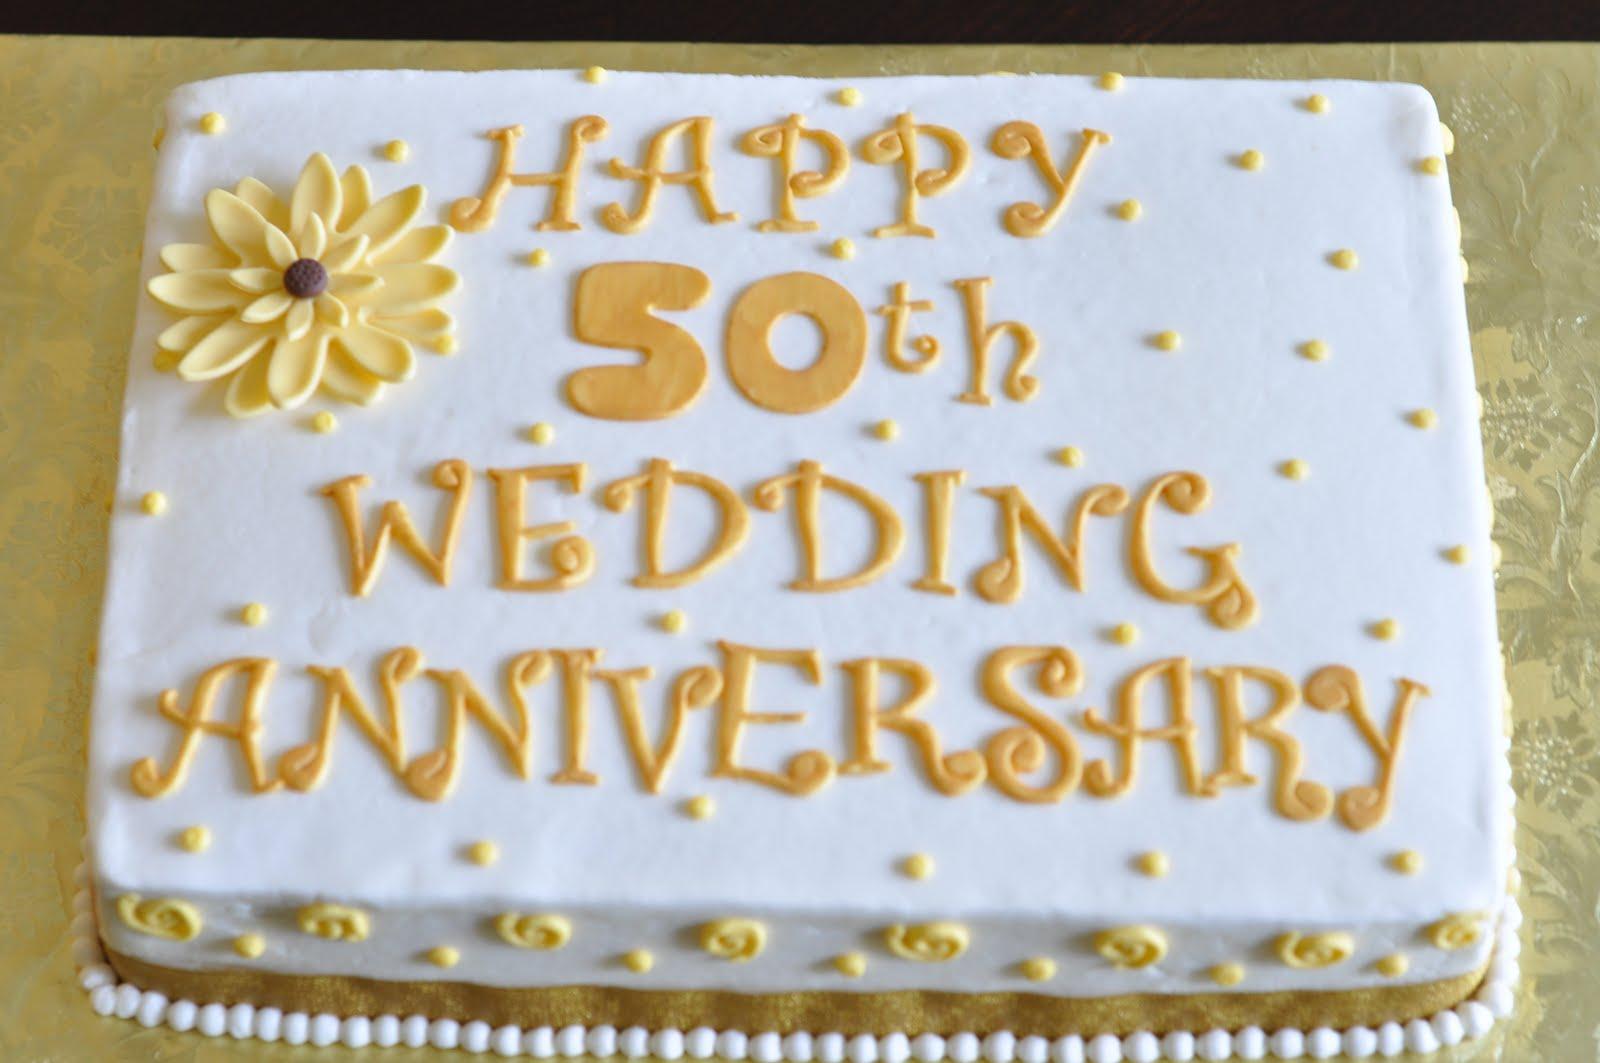 50th Anniversary Quotes 50th wedding anniversary quotes   Quotes links 50th Anniversary Quotes